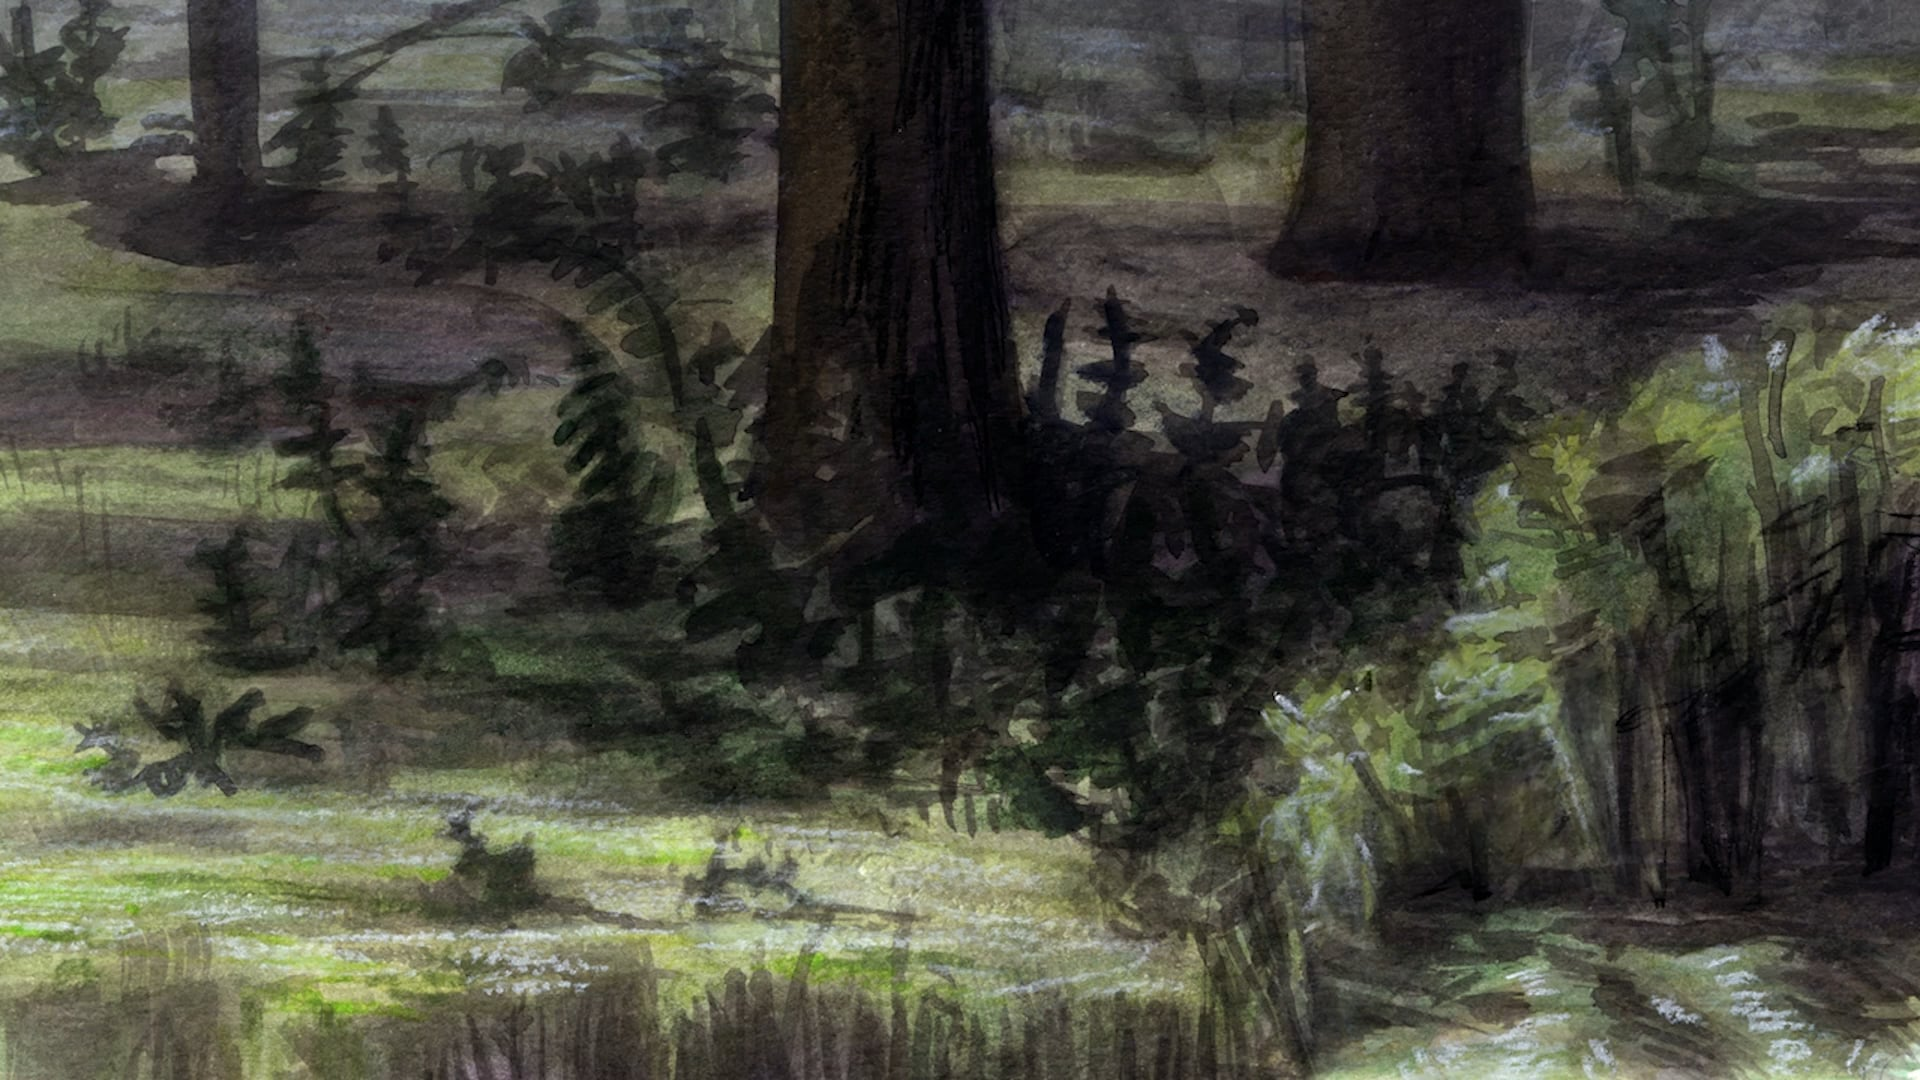 Procès Sauvage (Wild Trial)